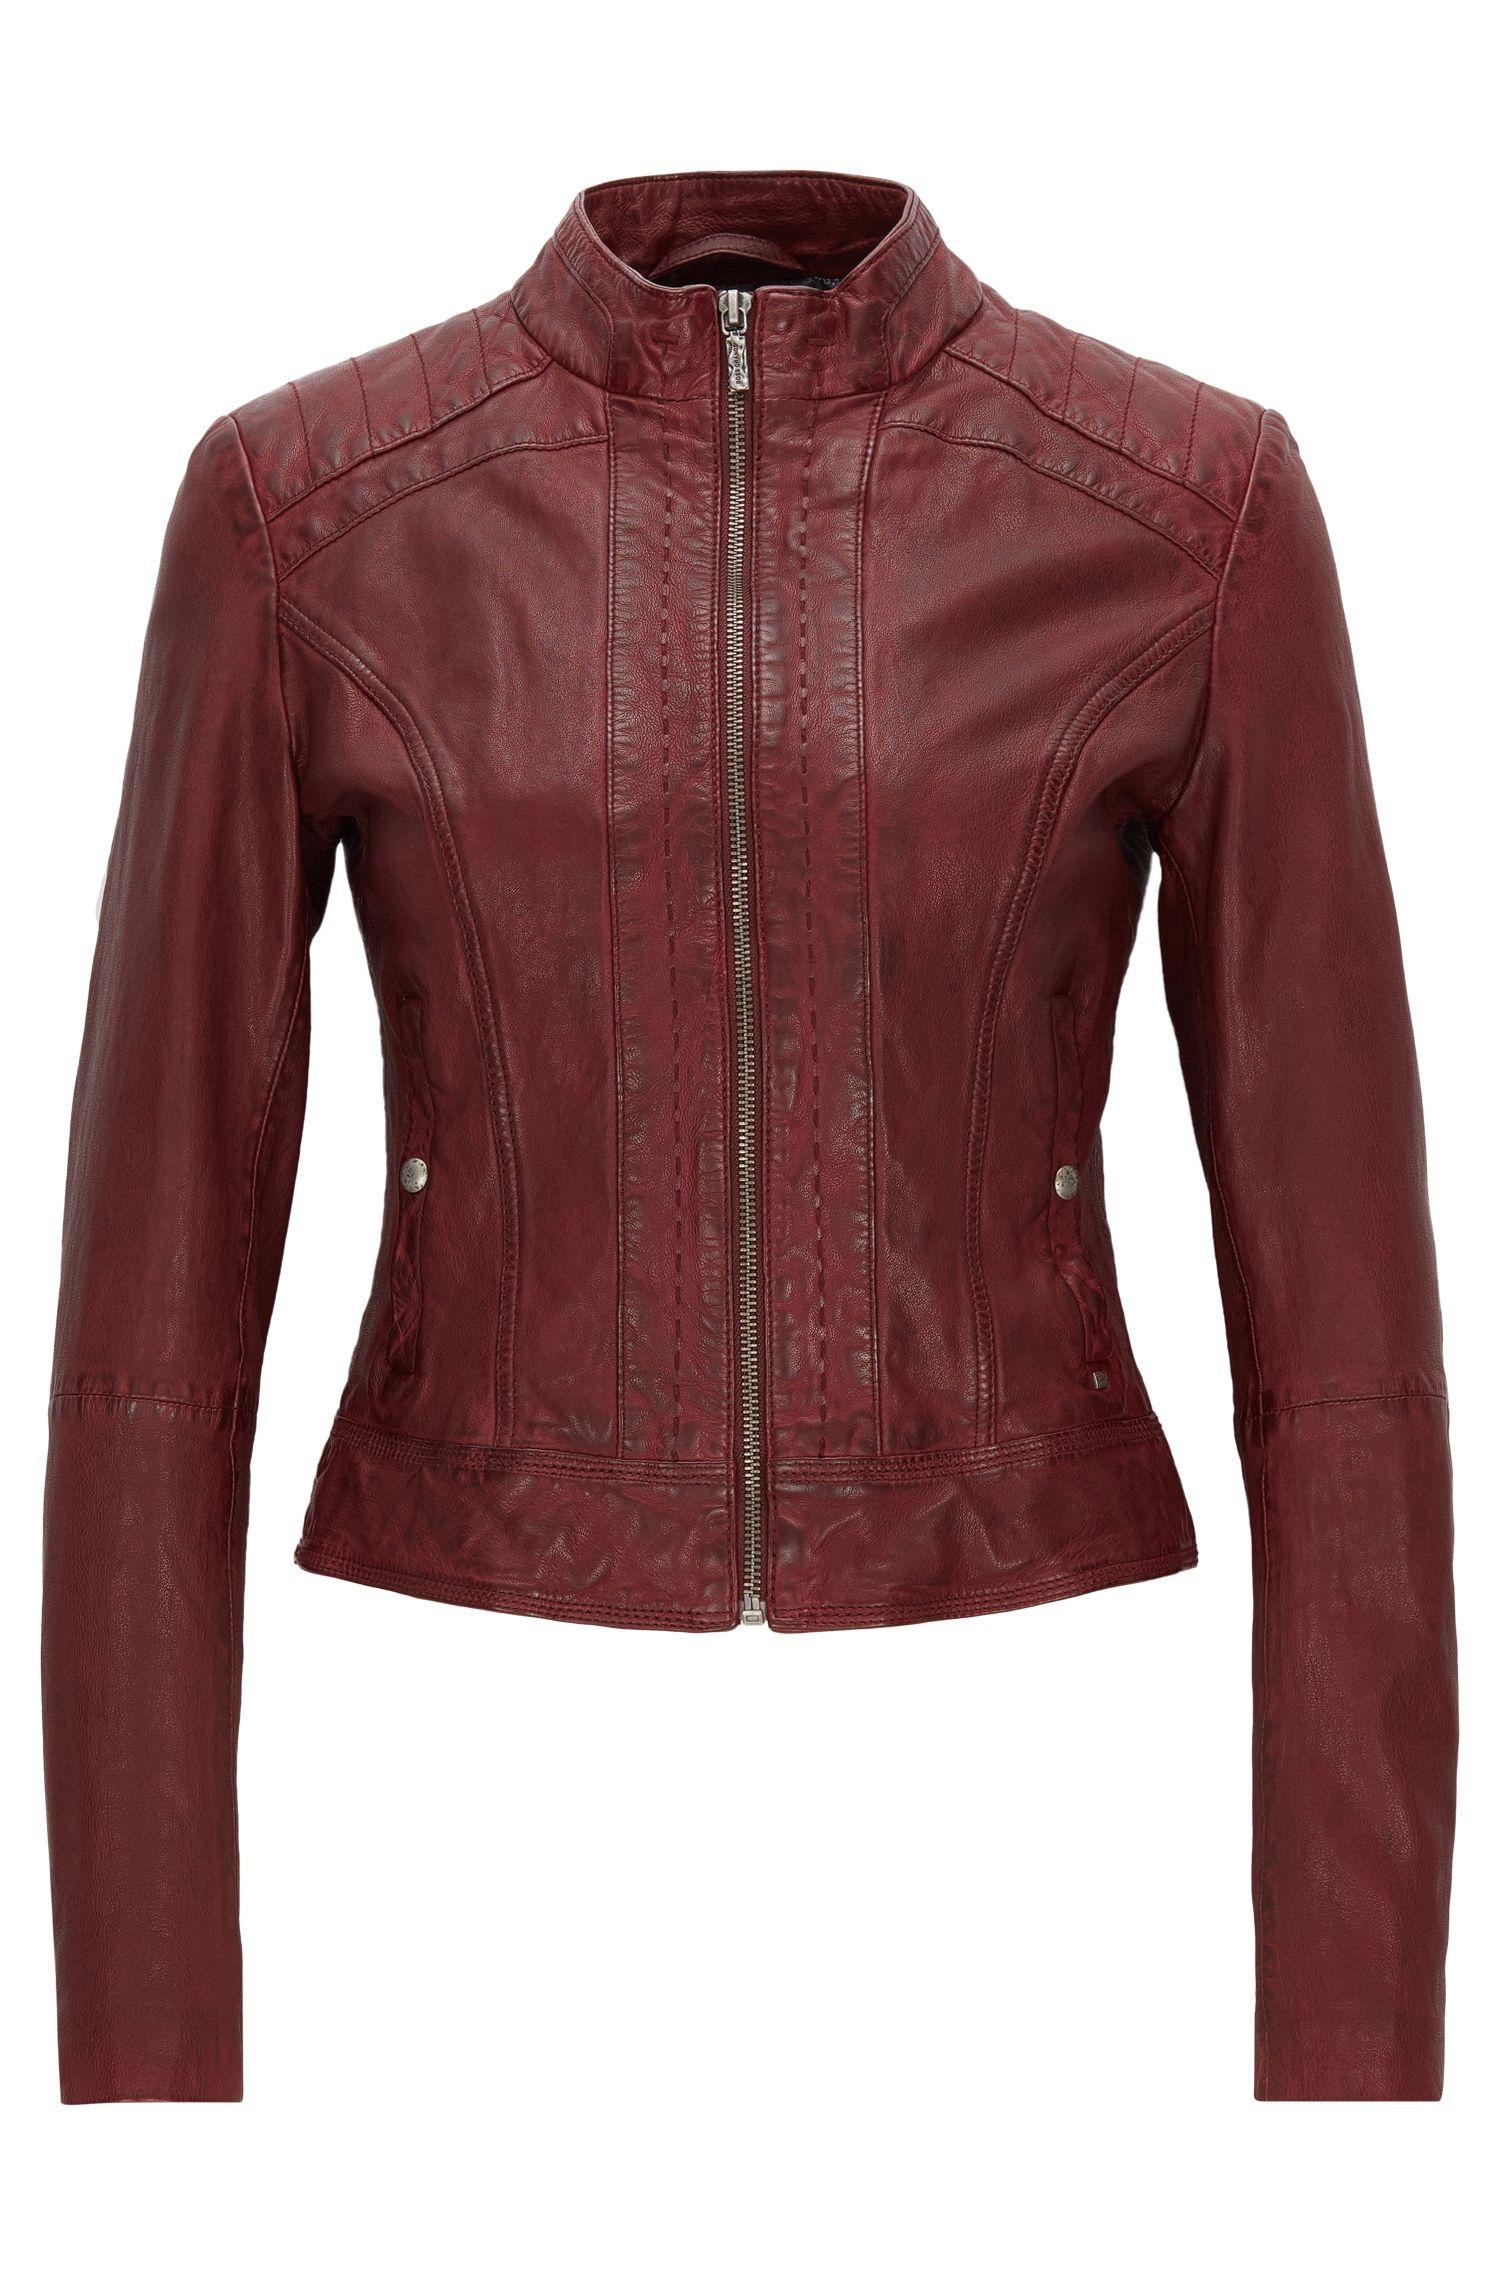 Sheepskin Leather Jacket | Janabelle